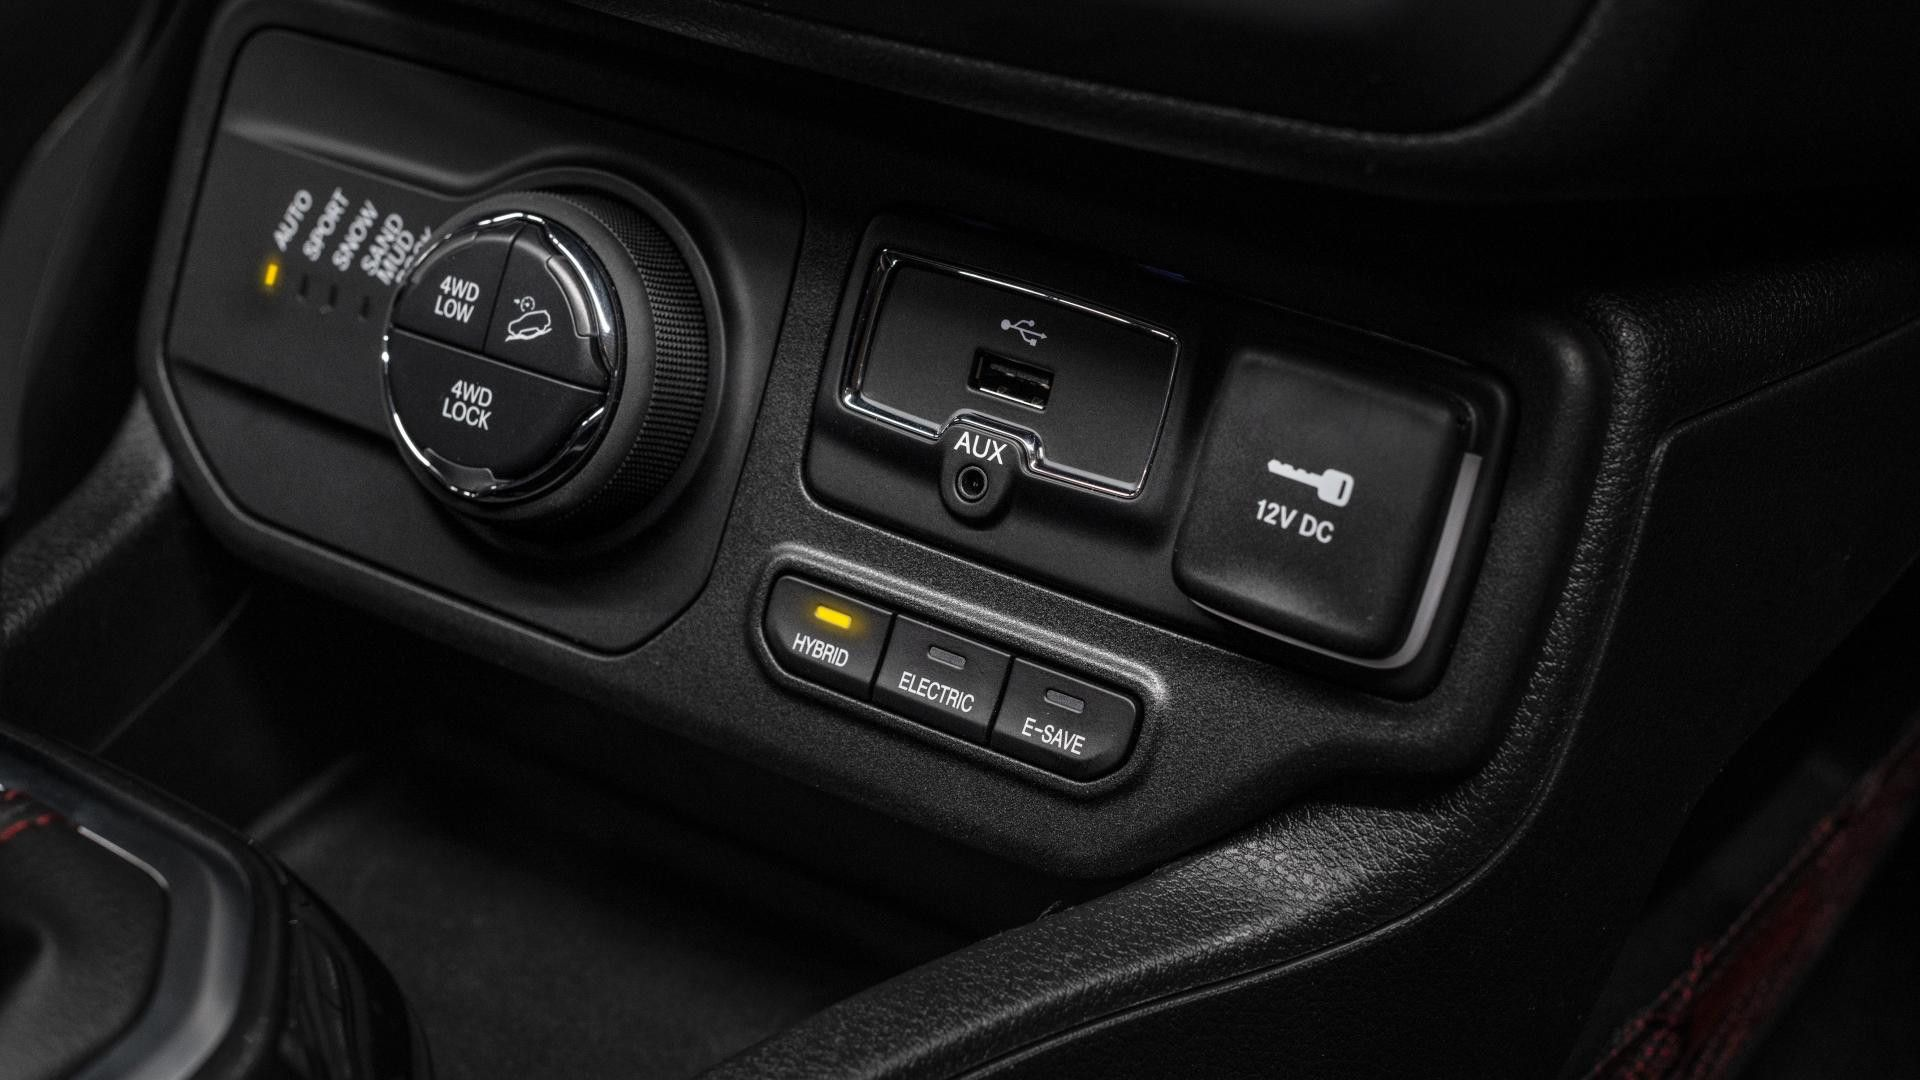 Jeep Renegade ibrida plug-in: quando esce? Ultime news dal ...